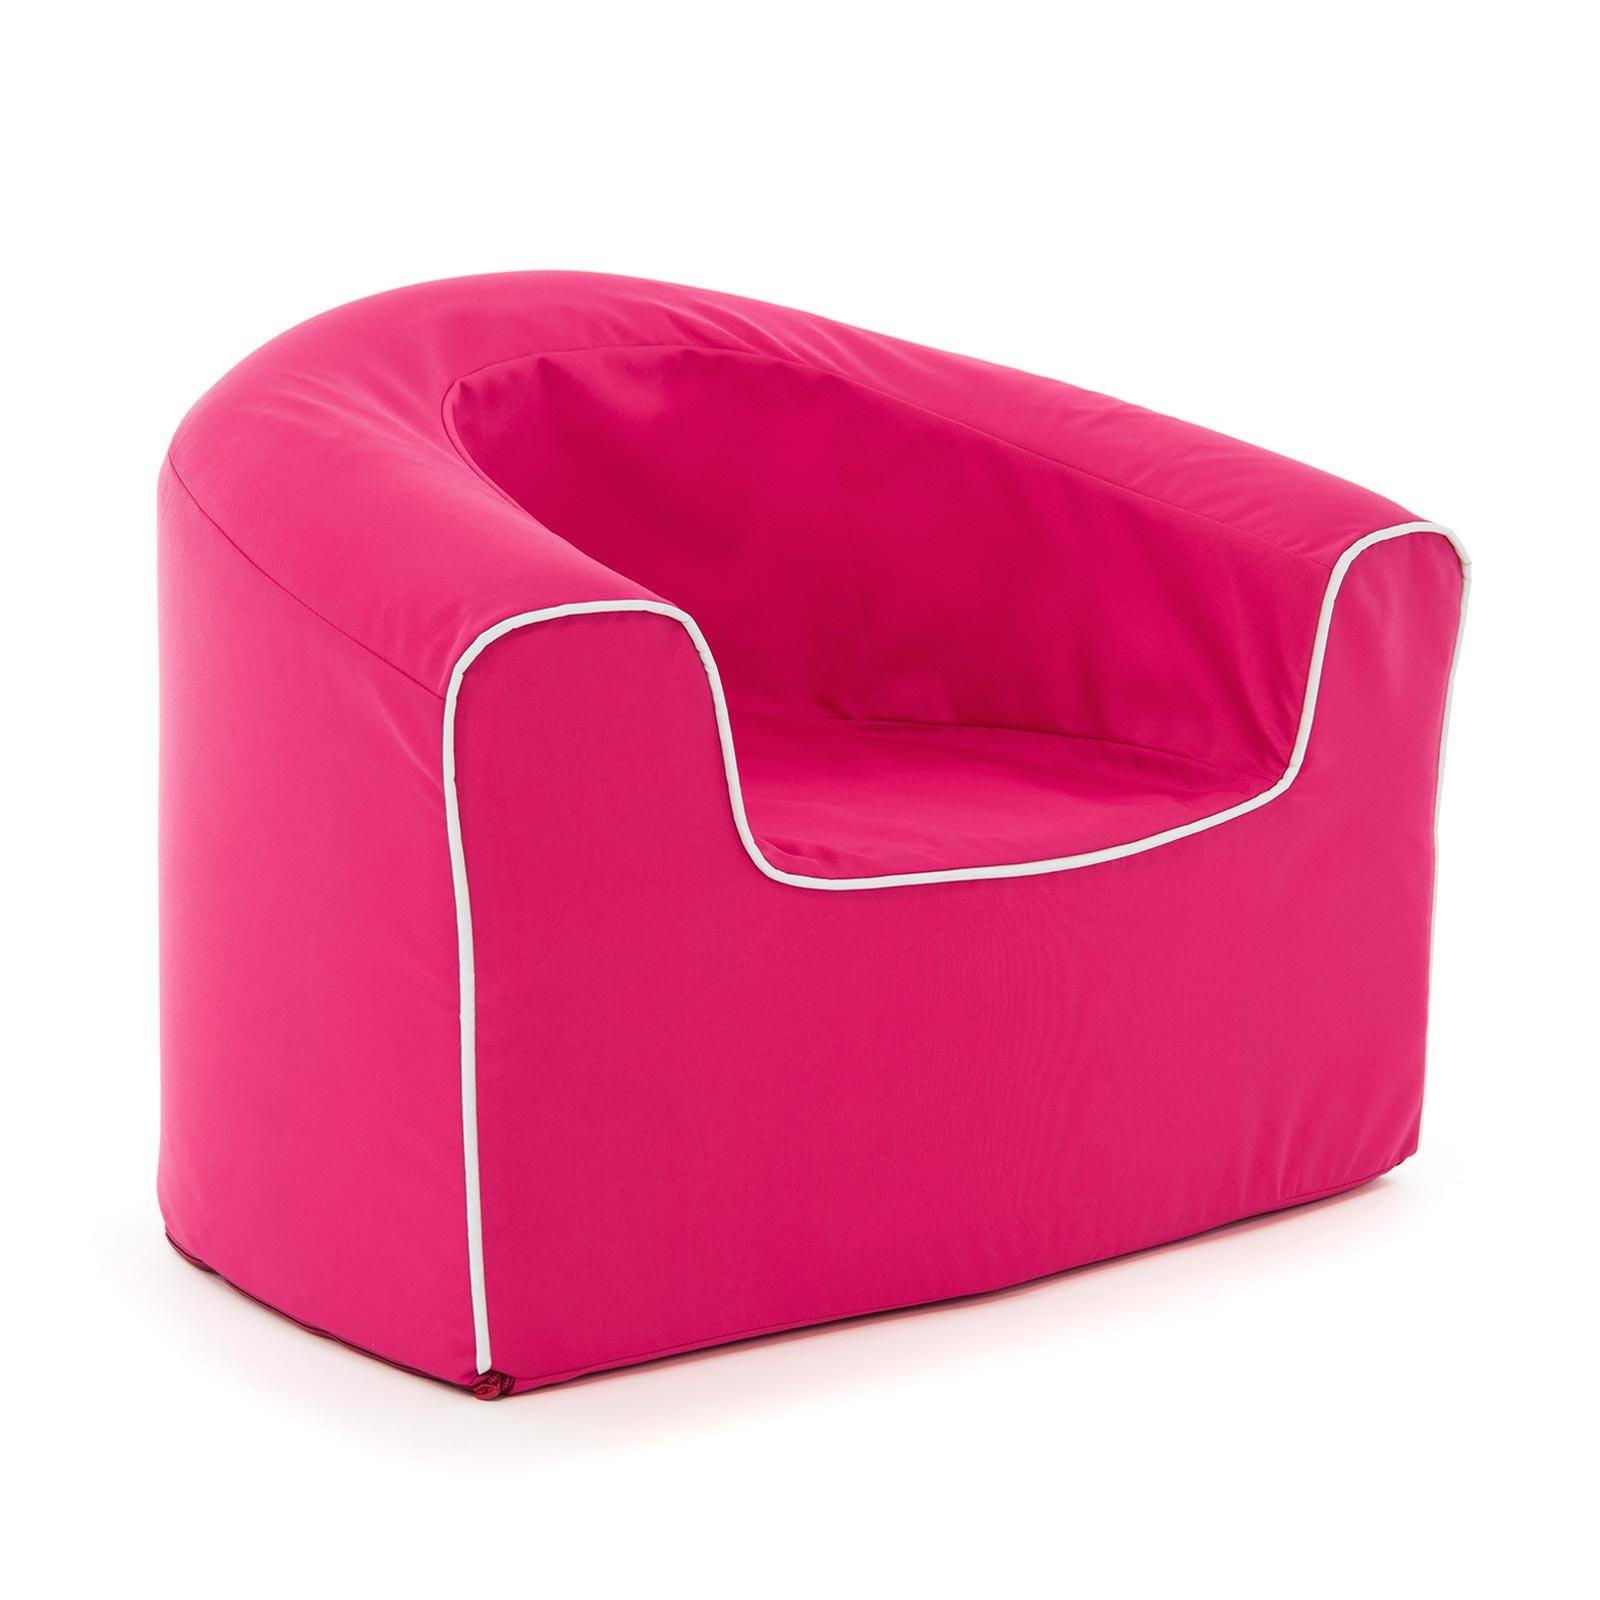 PopLounge Expandable Foam Furniture Junior Armchair, Raspberry Pink, 26'' x 20'' x 20''